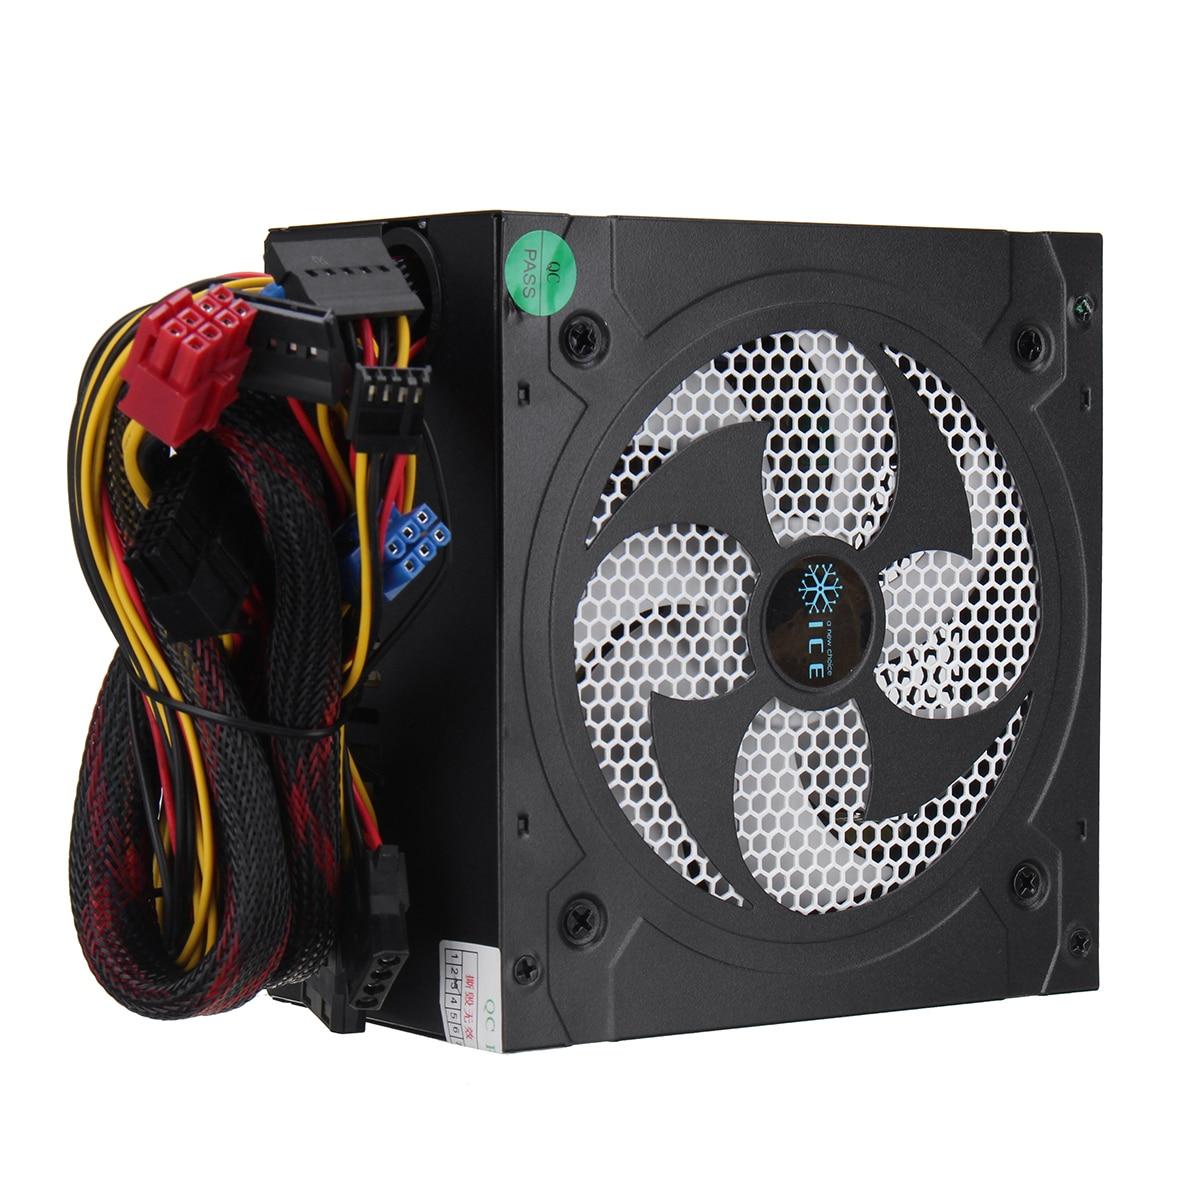 все цены на Quiet 500W Desktop BTC Miner Power Supply With SATA 20PIN+4PIN Power Supply ATX Power Switching For Miner Mining онлайн